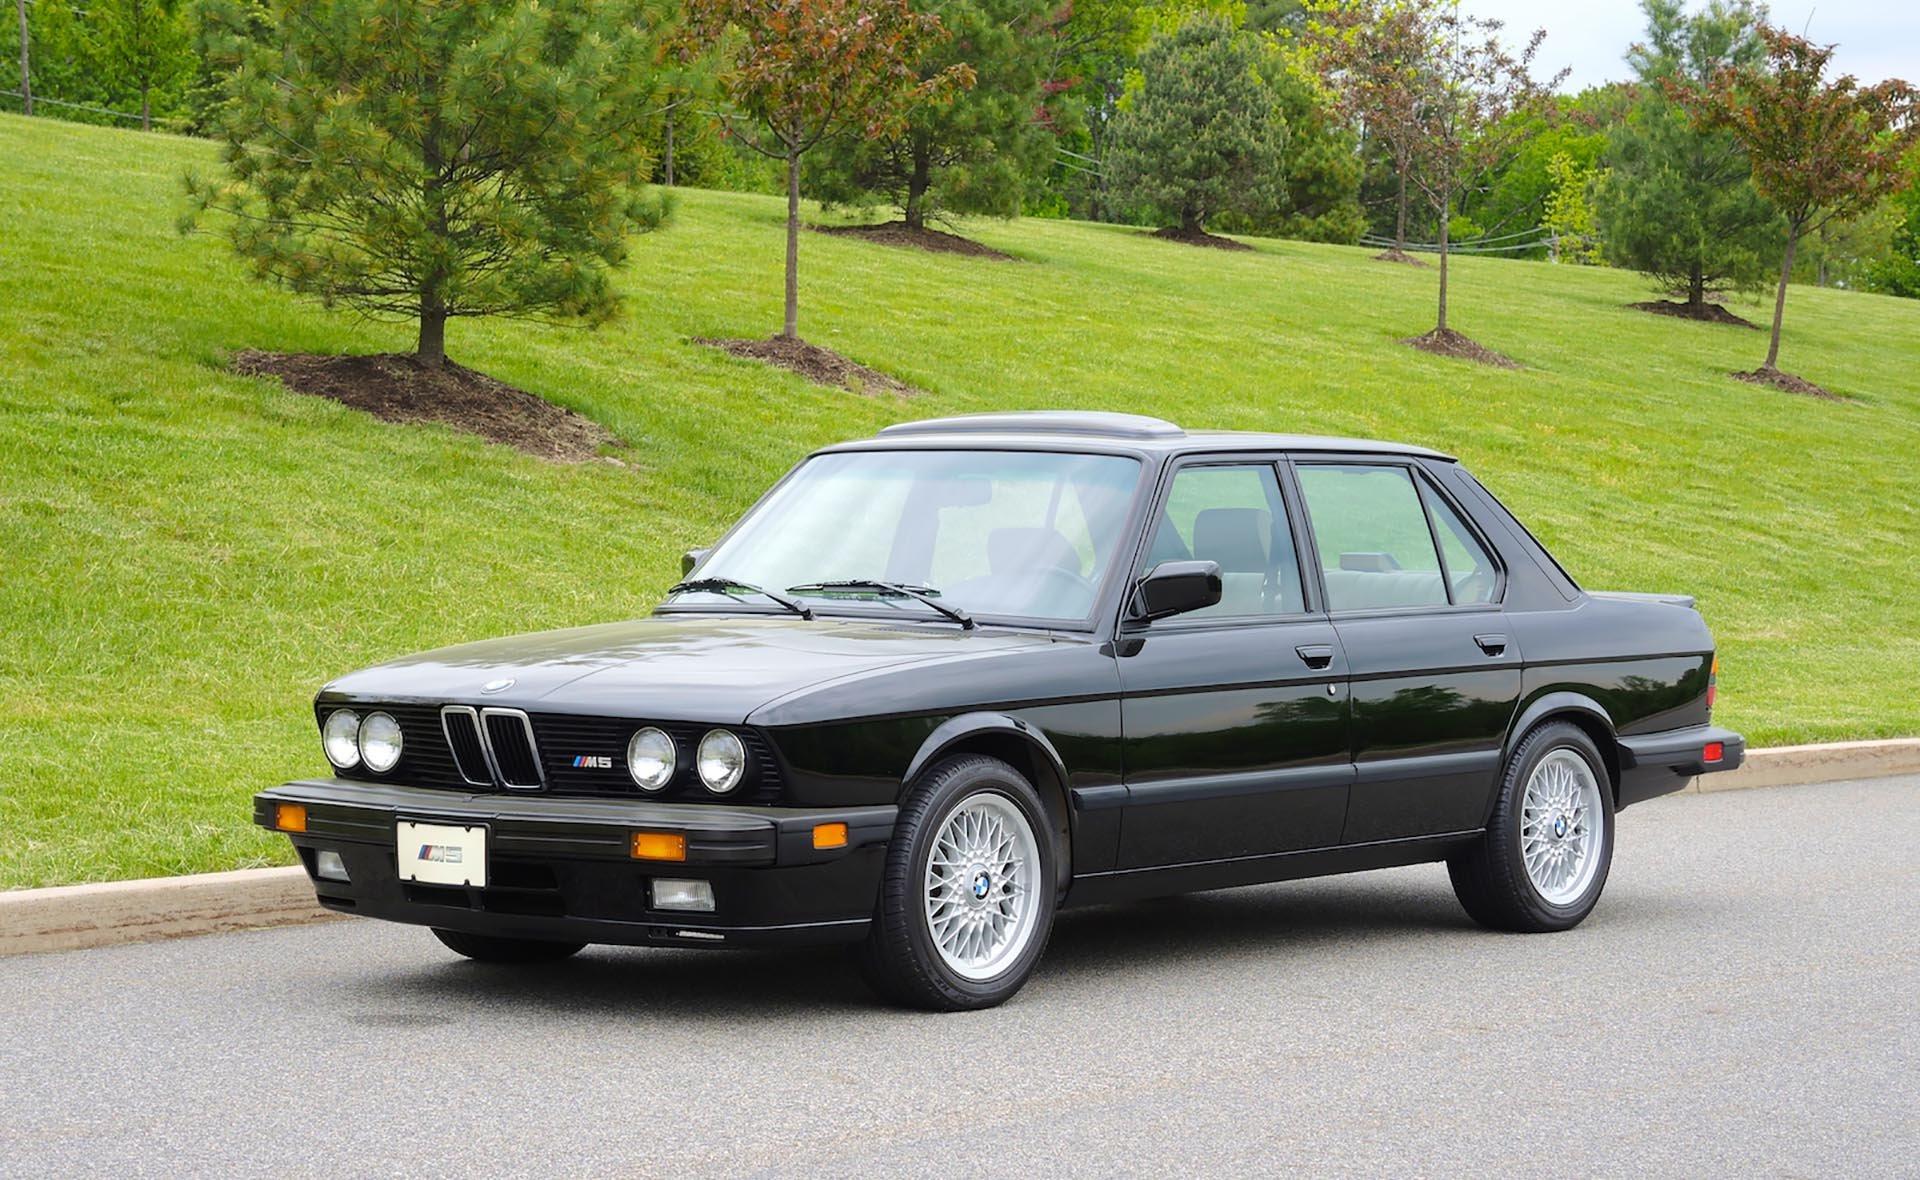 04_BMW E28 M5 front USA